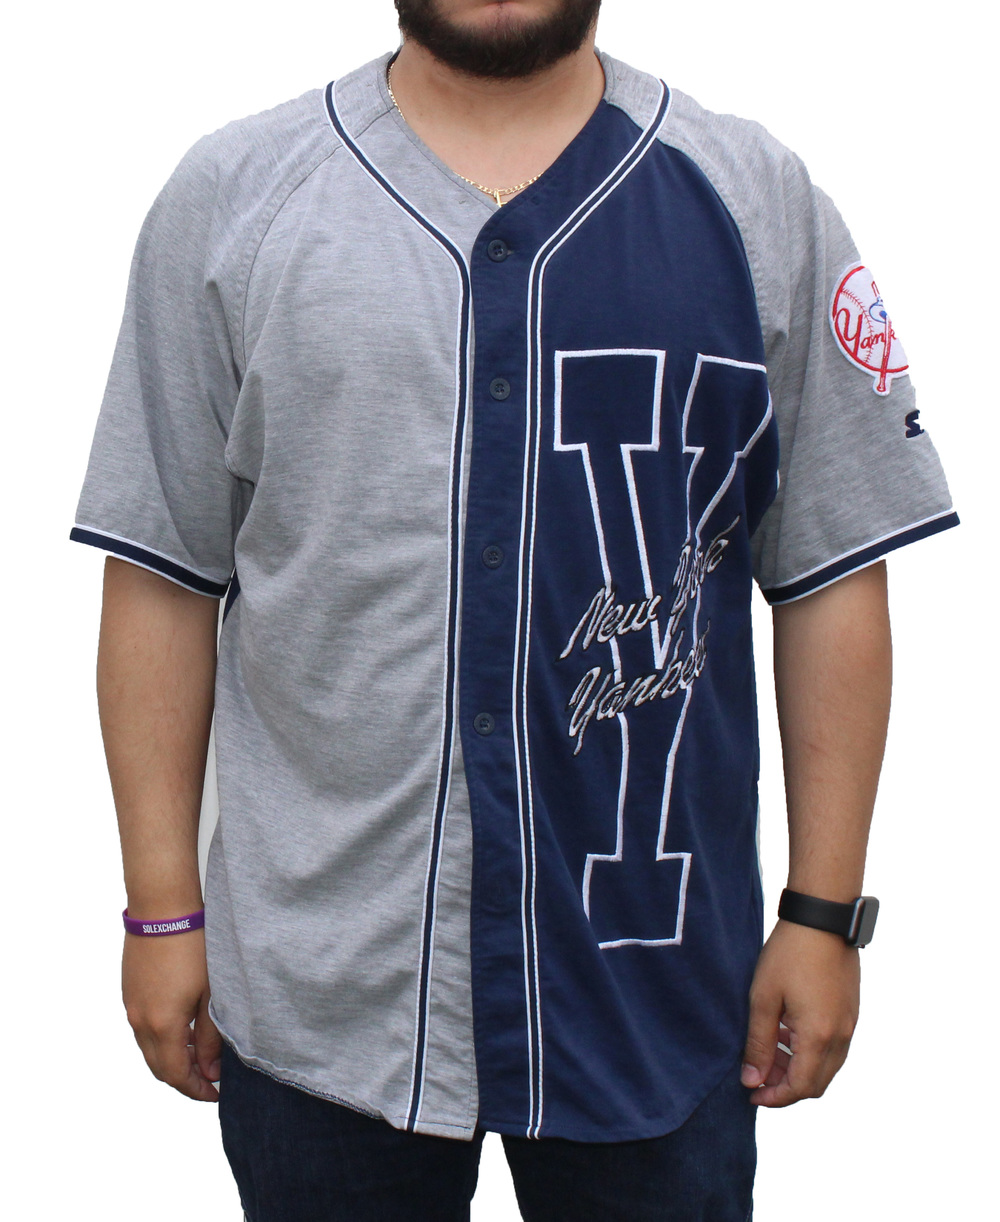 f3acaa8914d Vintage Starter New York Yankees Baseball Jersey (Size XL) — Roots